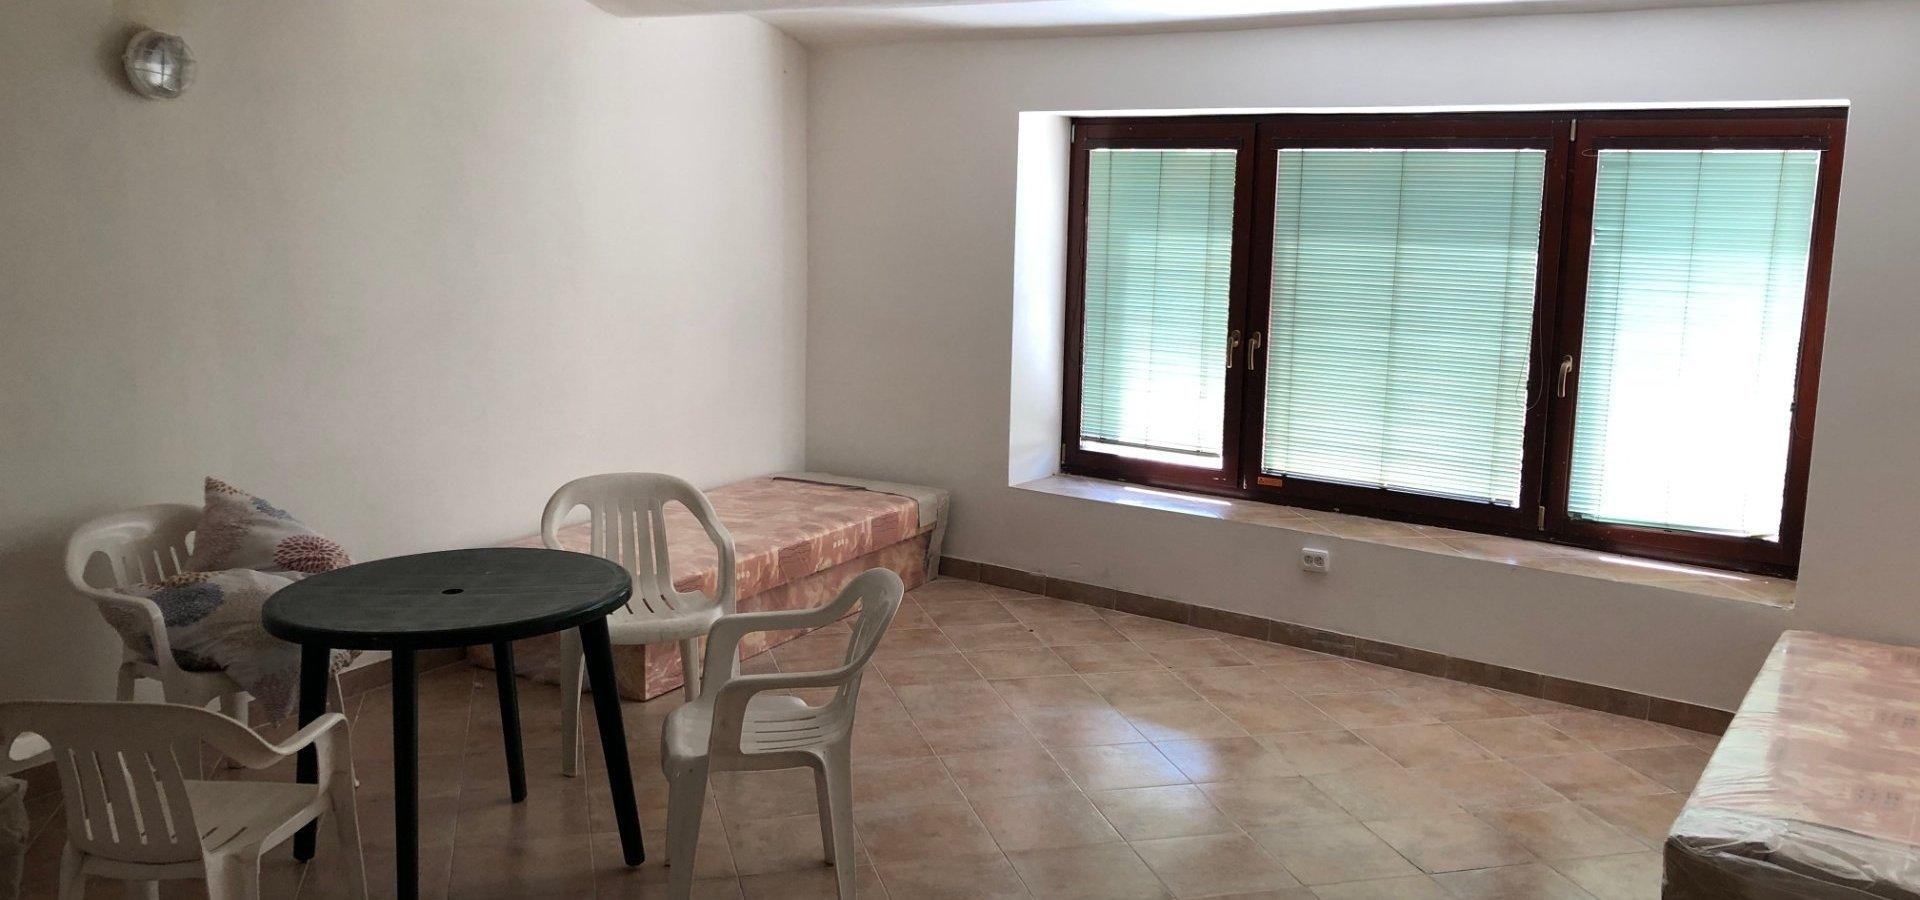 prodej-rodinneho-domu-na-bydleni-i-investici-477m2-telc-img-6181-bad254